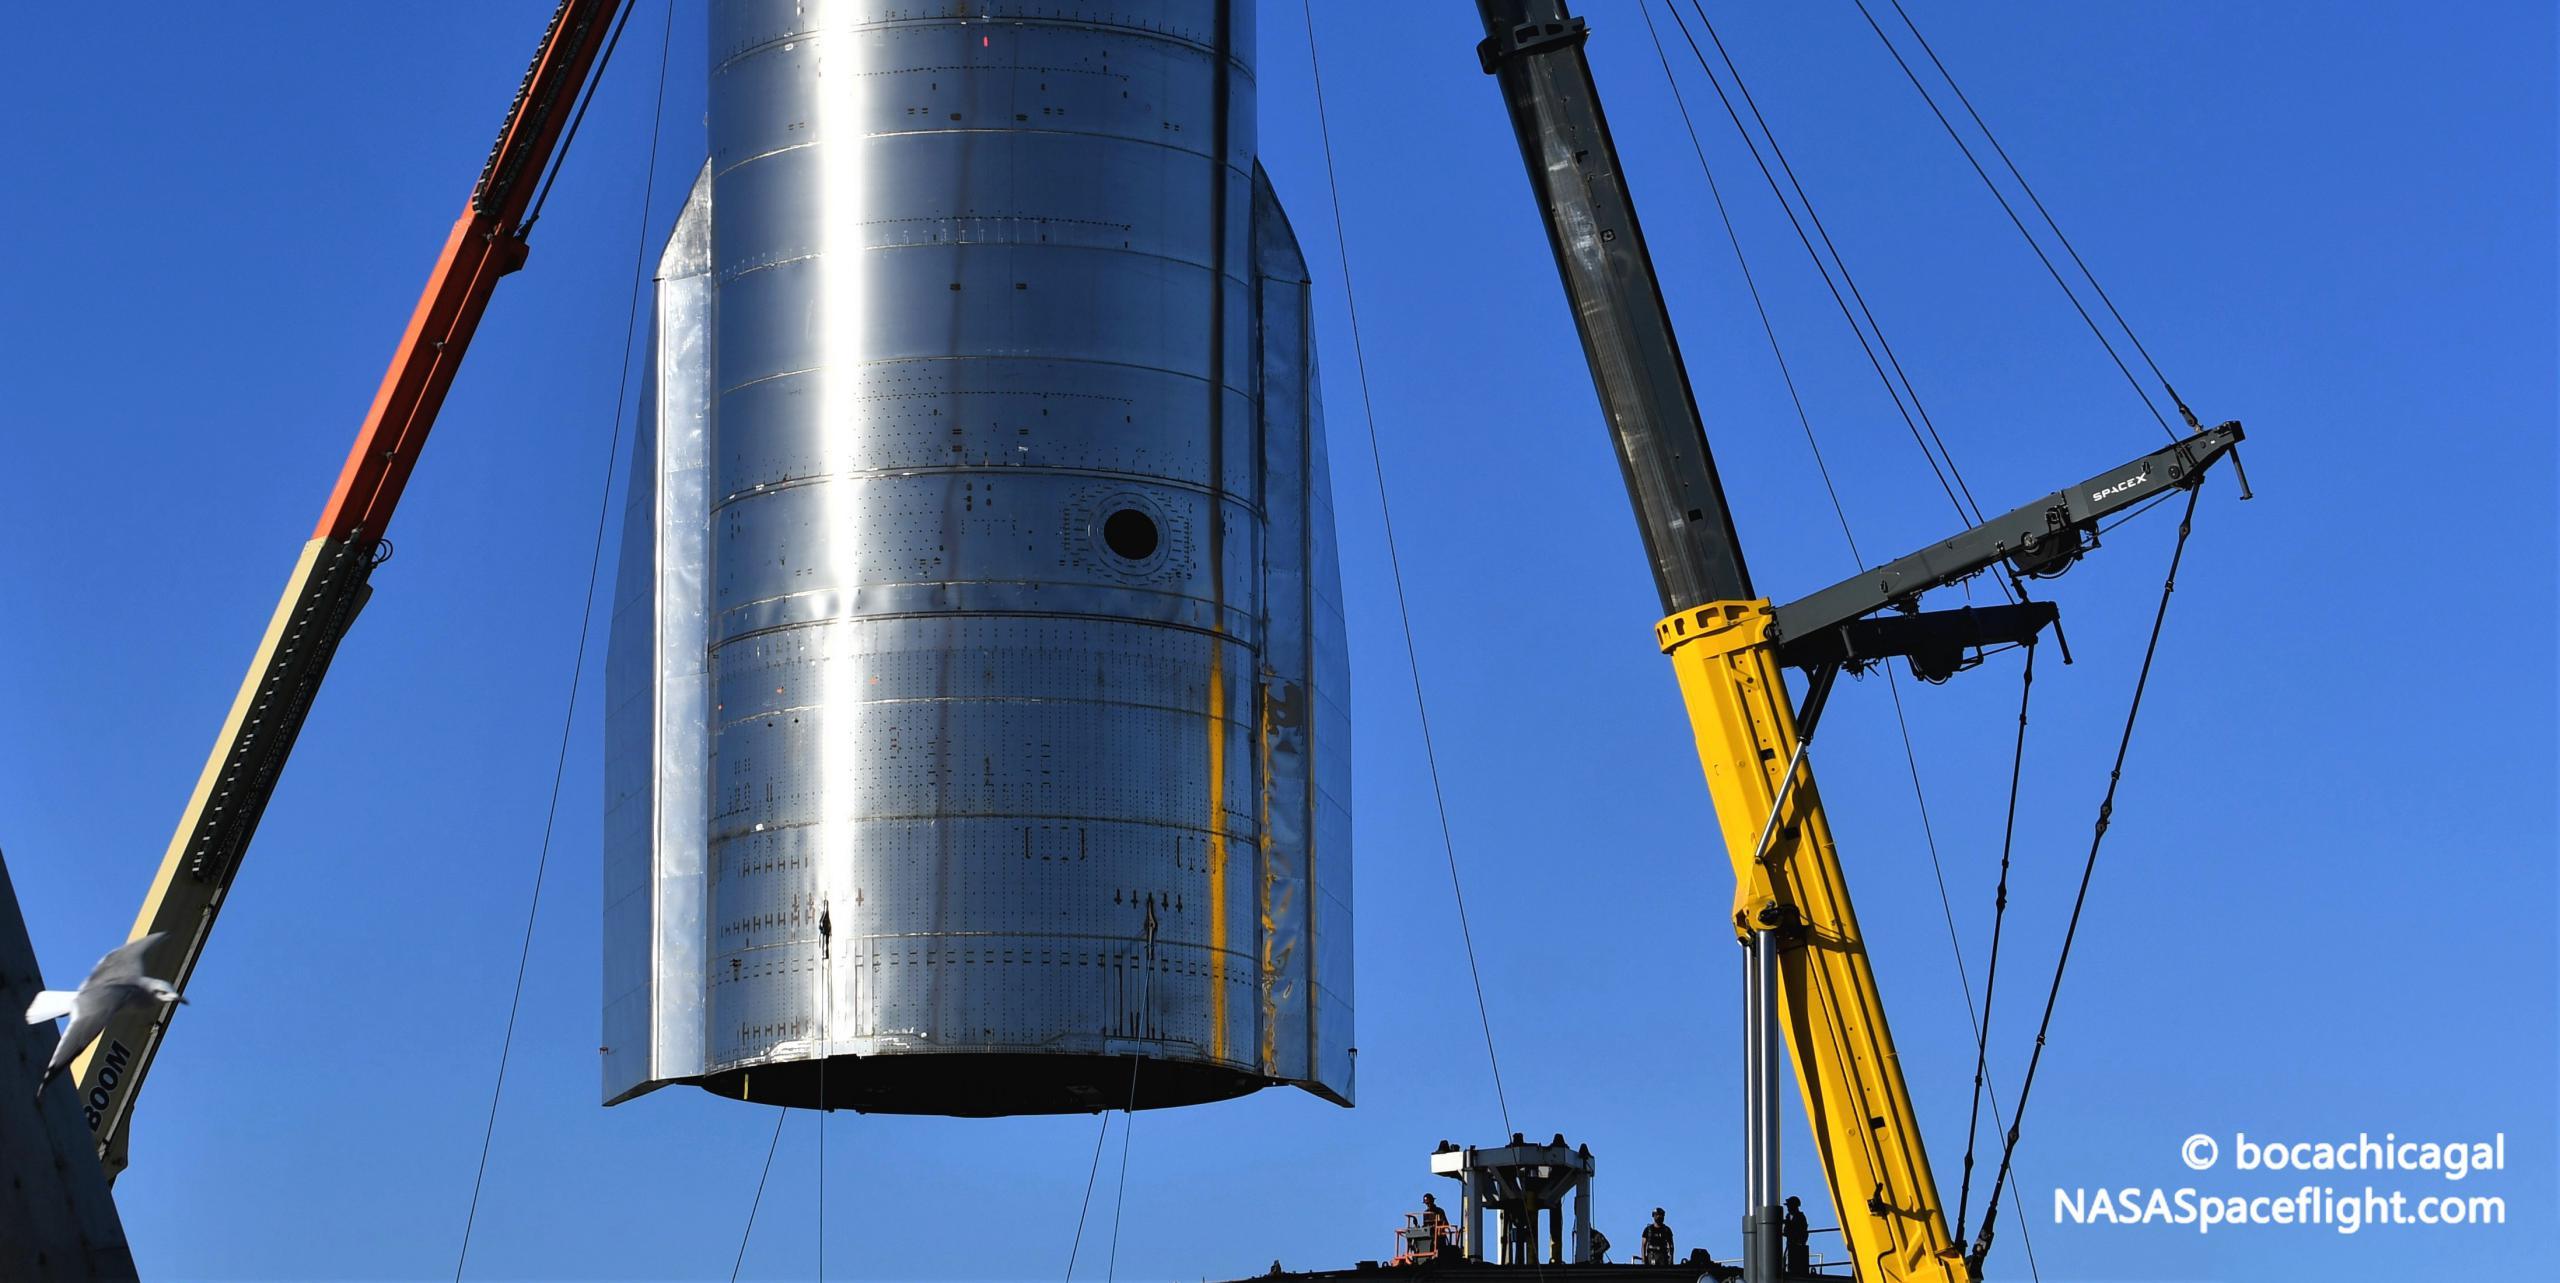 Starship Boca Chica 093020 (NASASpaceflight – bocachicagal) SN8 mount lift 9 crop (c)